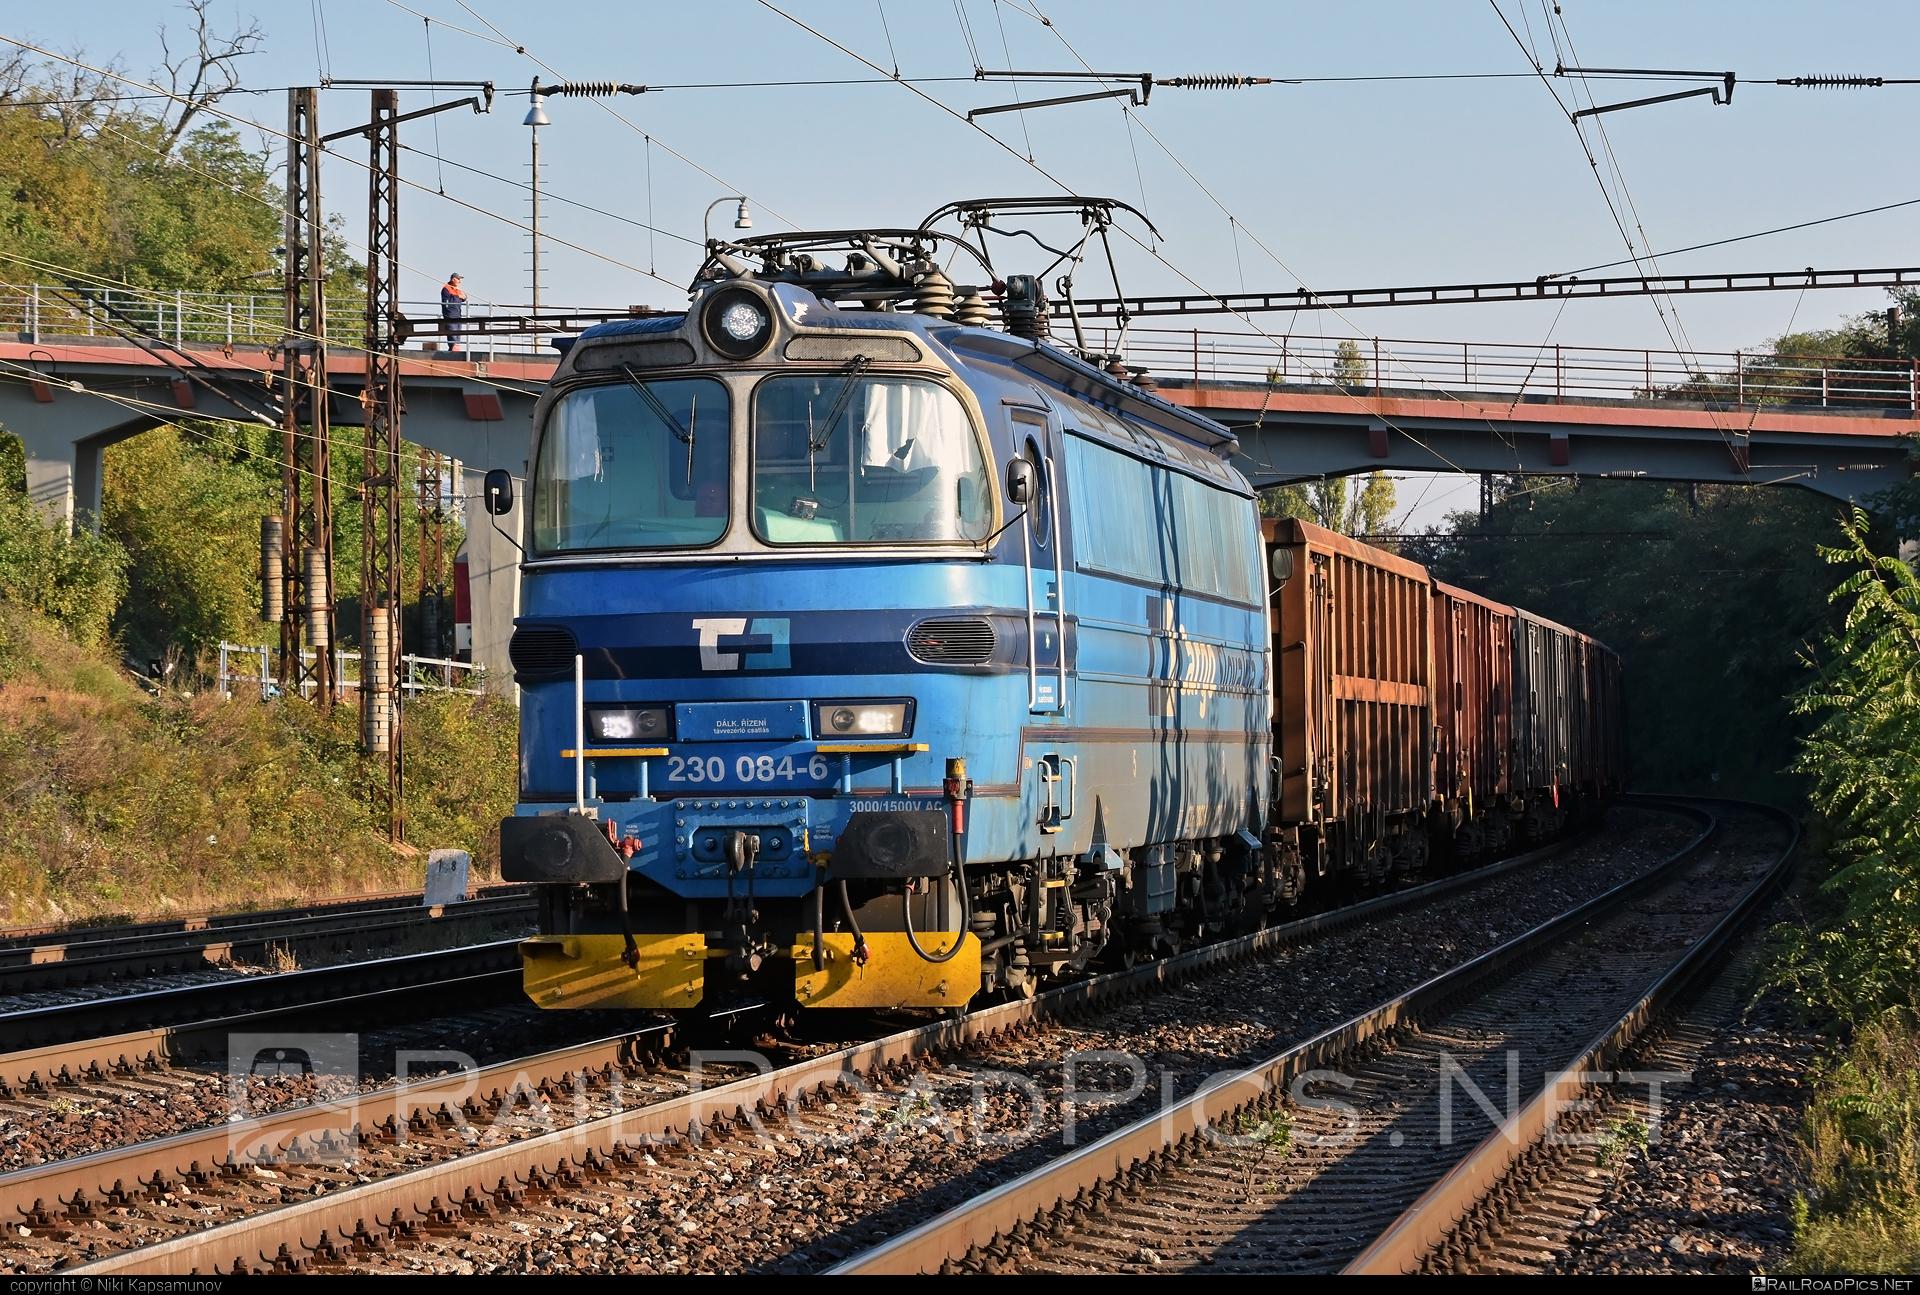 Škoda 47E - 230 084-6 operated by ČD Cargo, a.s. #cdcargo #laminatka #locomotive240 #skoda #skoda47e